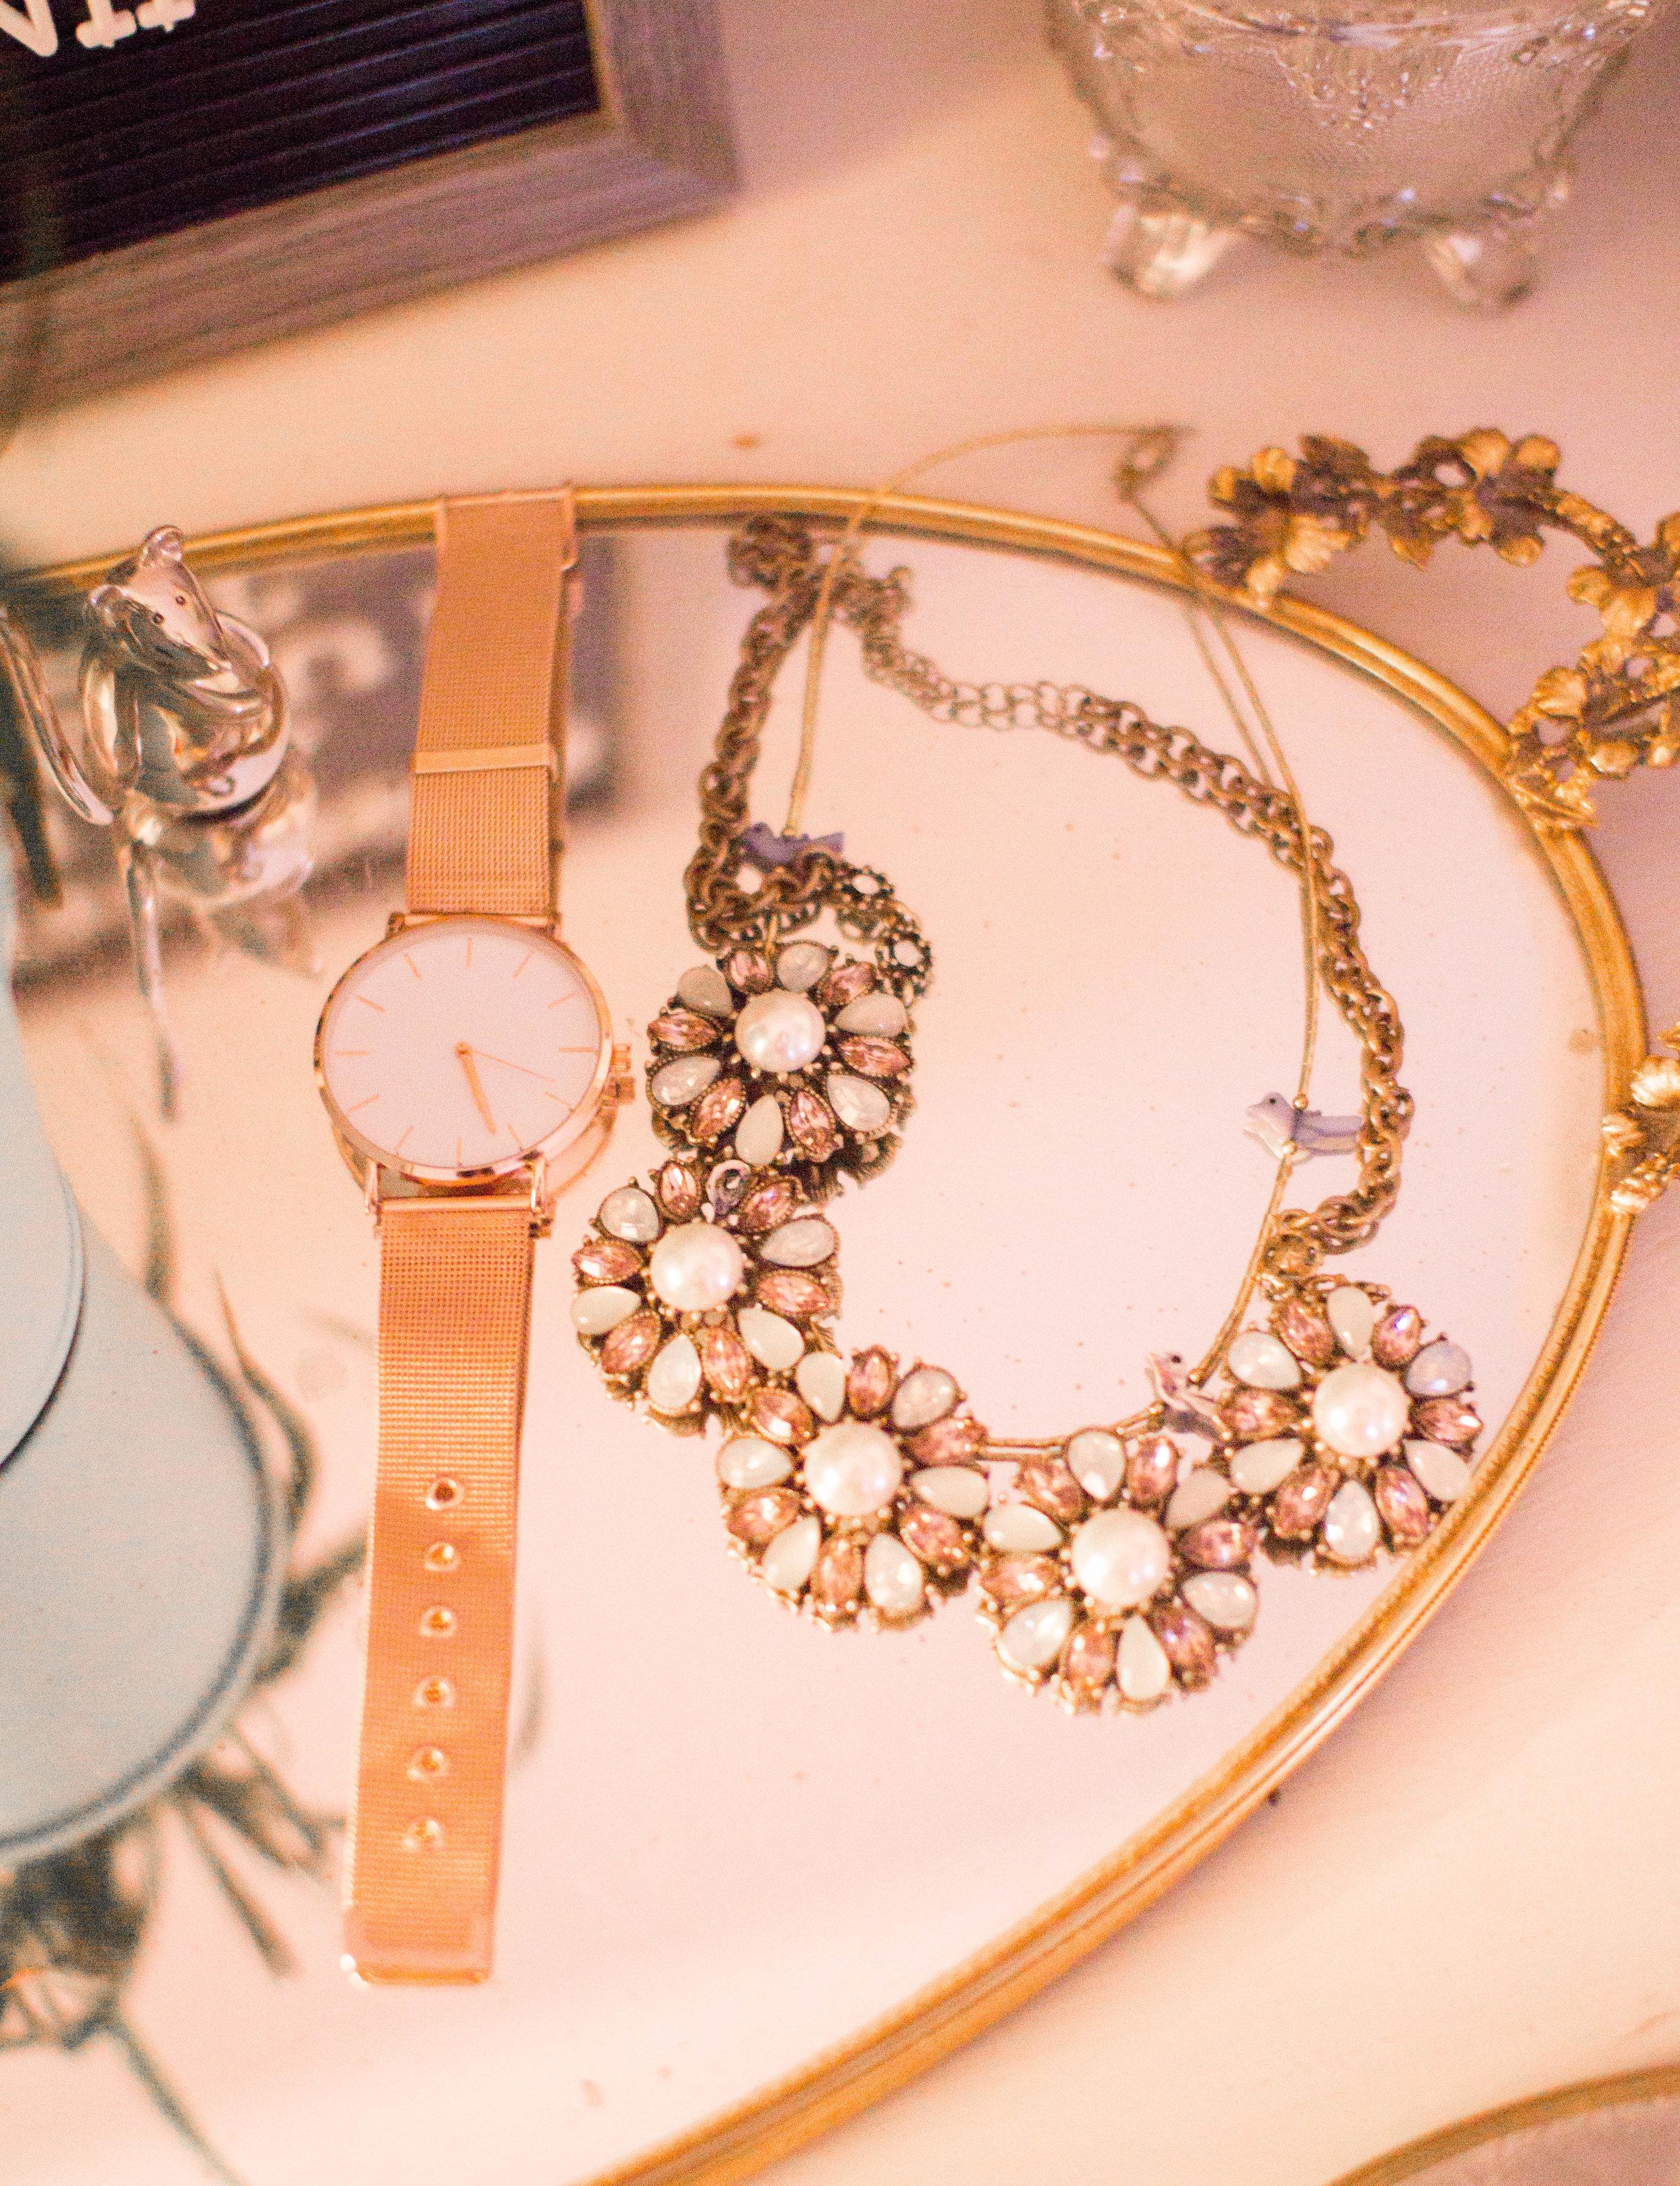 Vintage Jewelry Tray Display